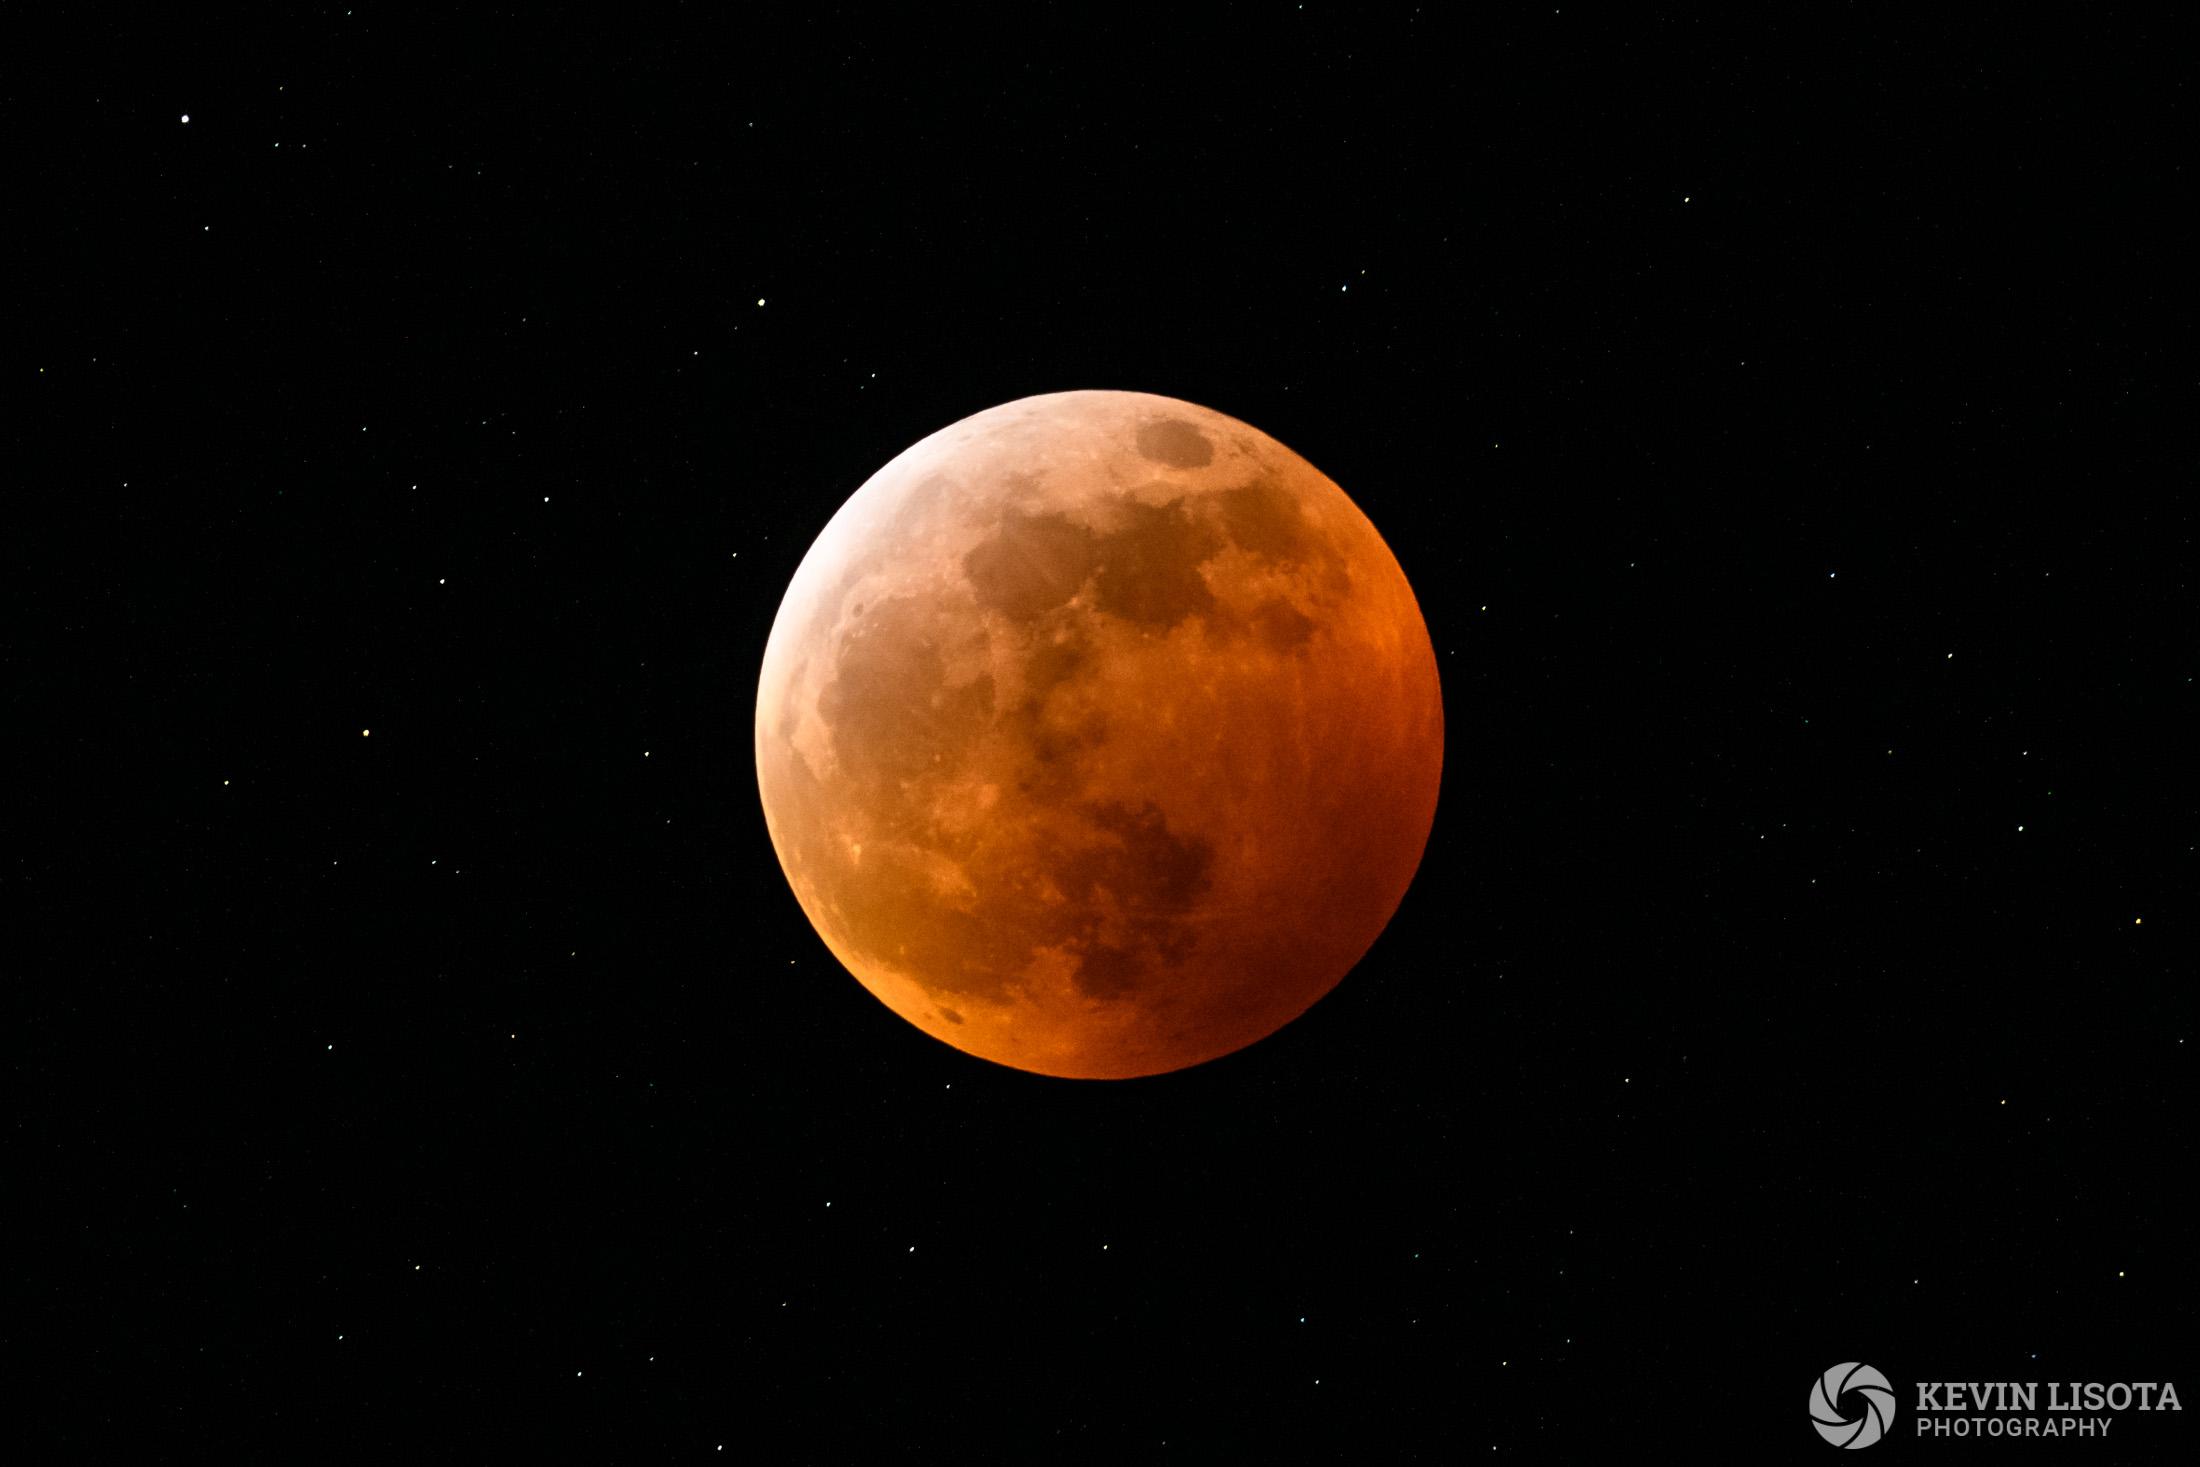 Lunar Eclipse - January 20, 2019